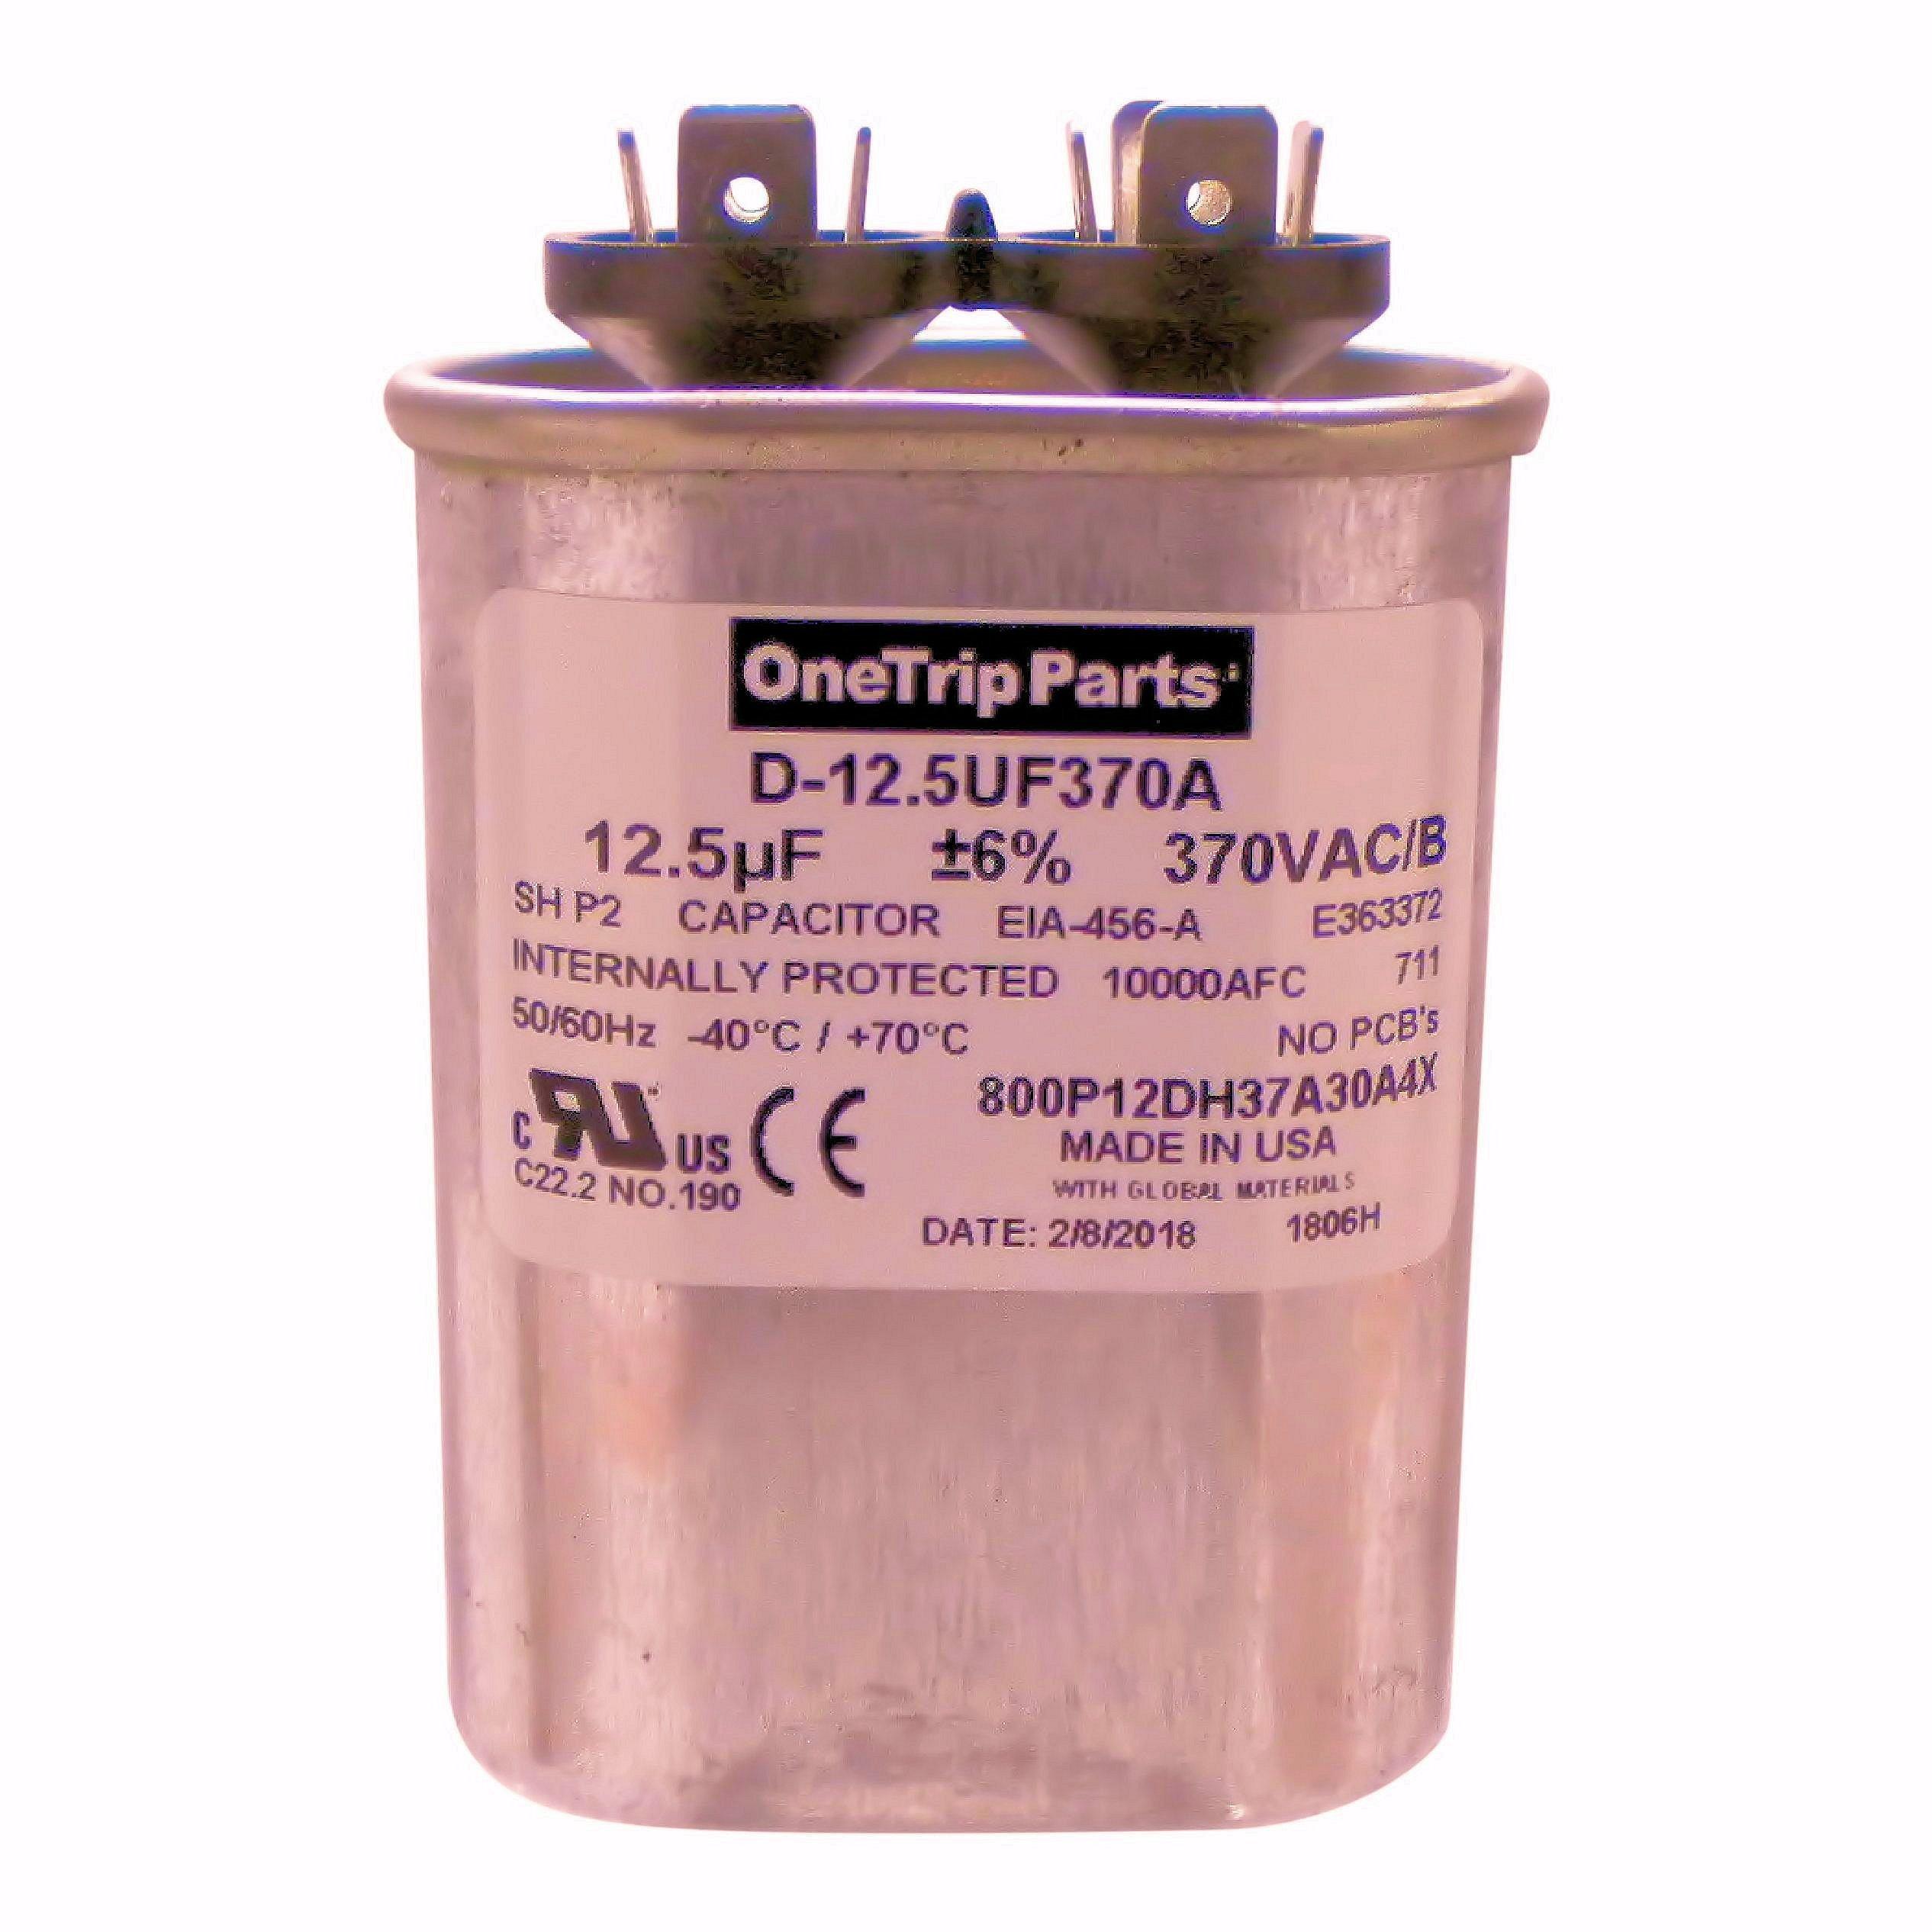 OneTrip Parts USA Run Capacitor 12.5 UF - 12.5 MFD 370 VAC Flat Oval